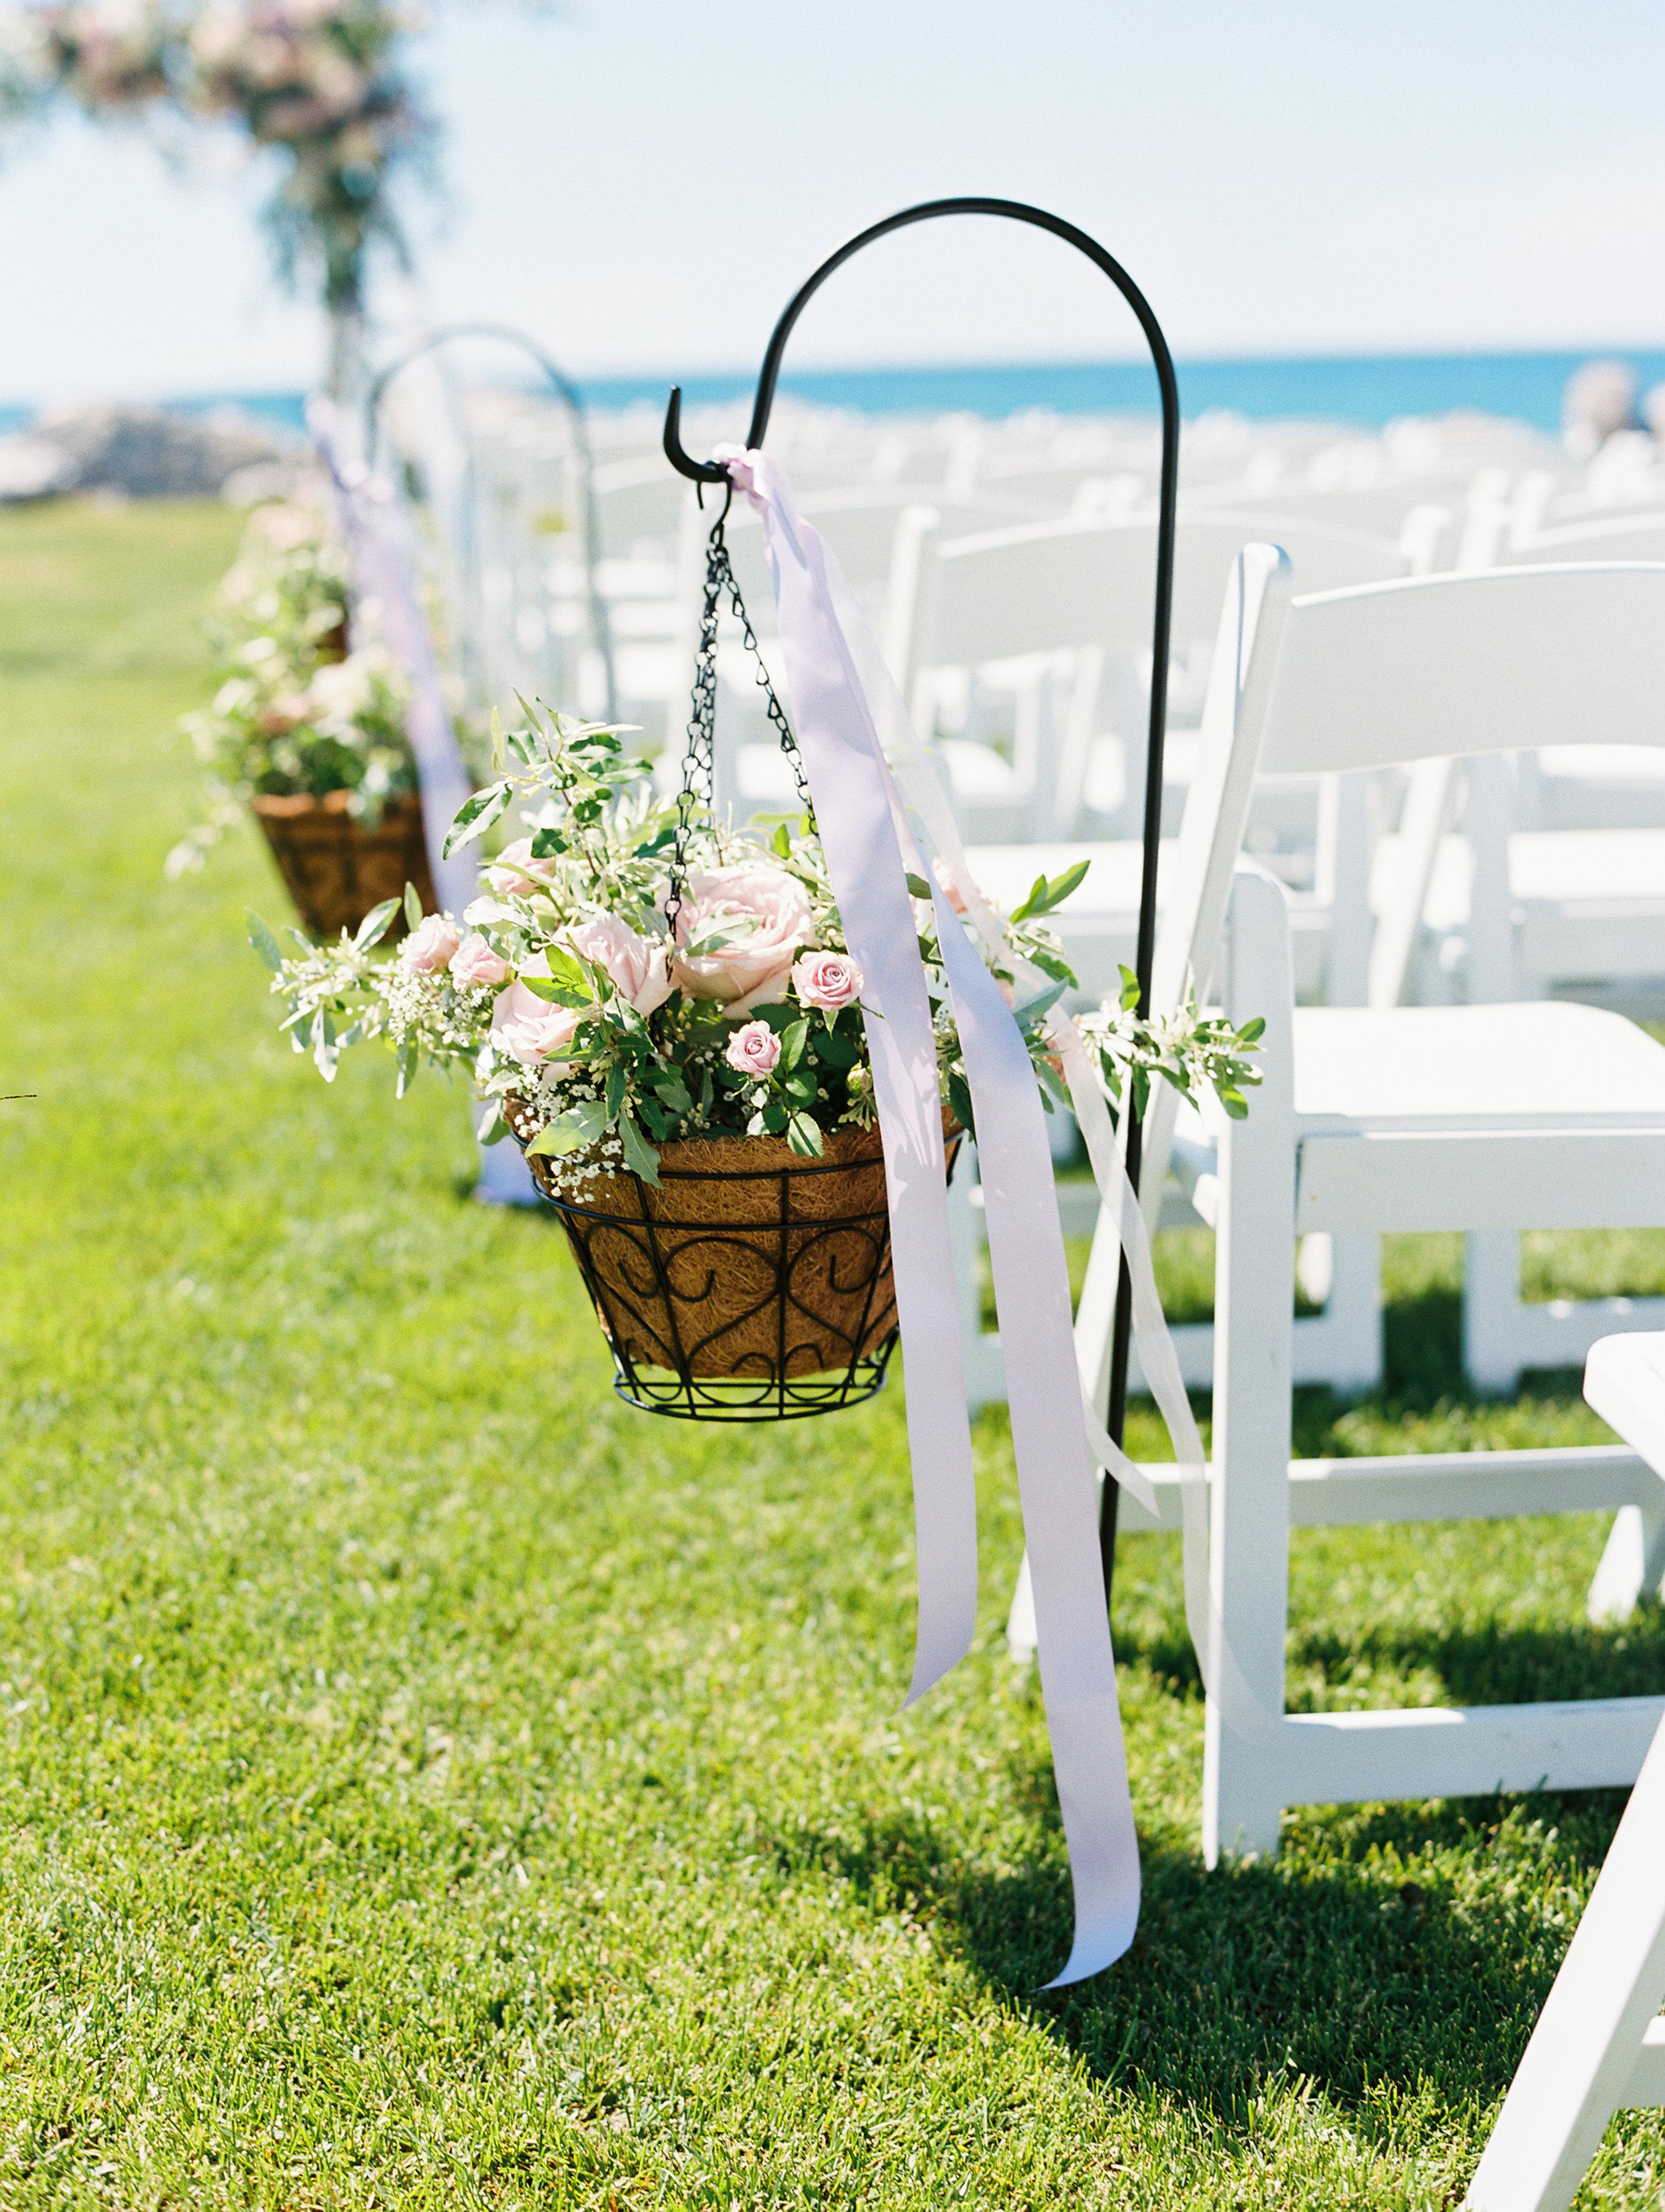 Noss+Wedding+Ceremony-2.jpg